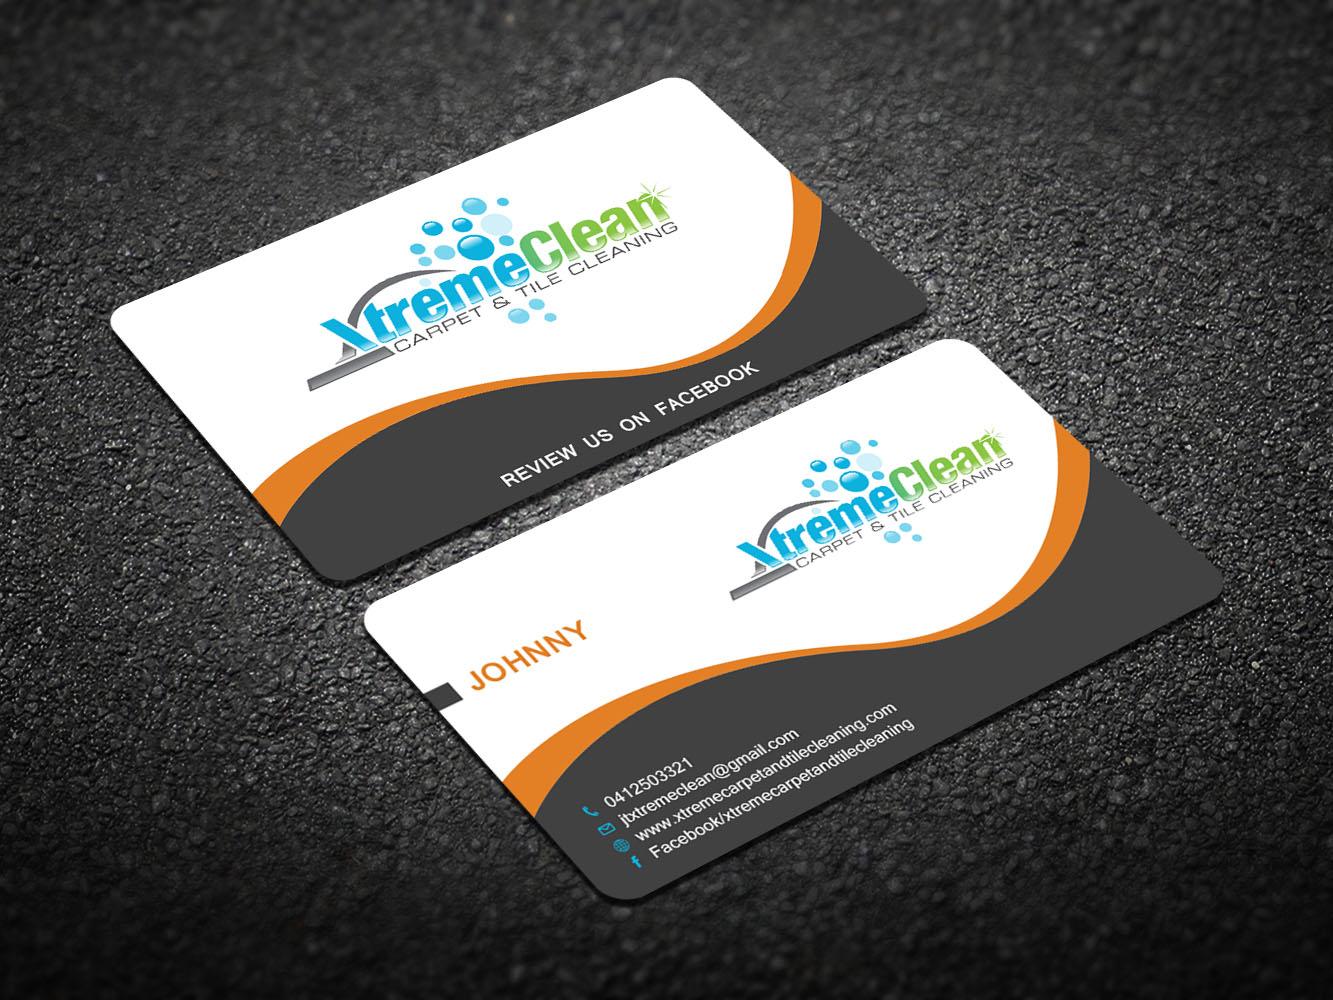 Modern personable business card design for xtreme carpet and tile business card design by creative design for xtreme carpet and tile cleaning business card design baanklon Gallery